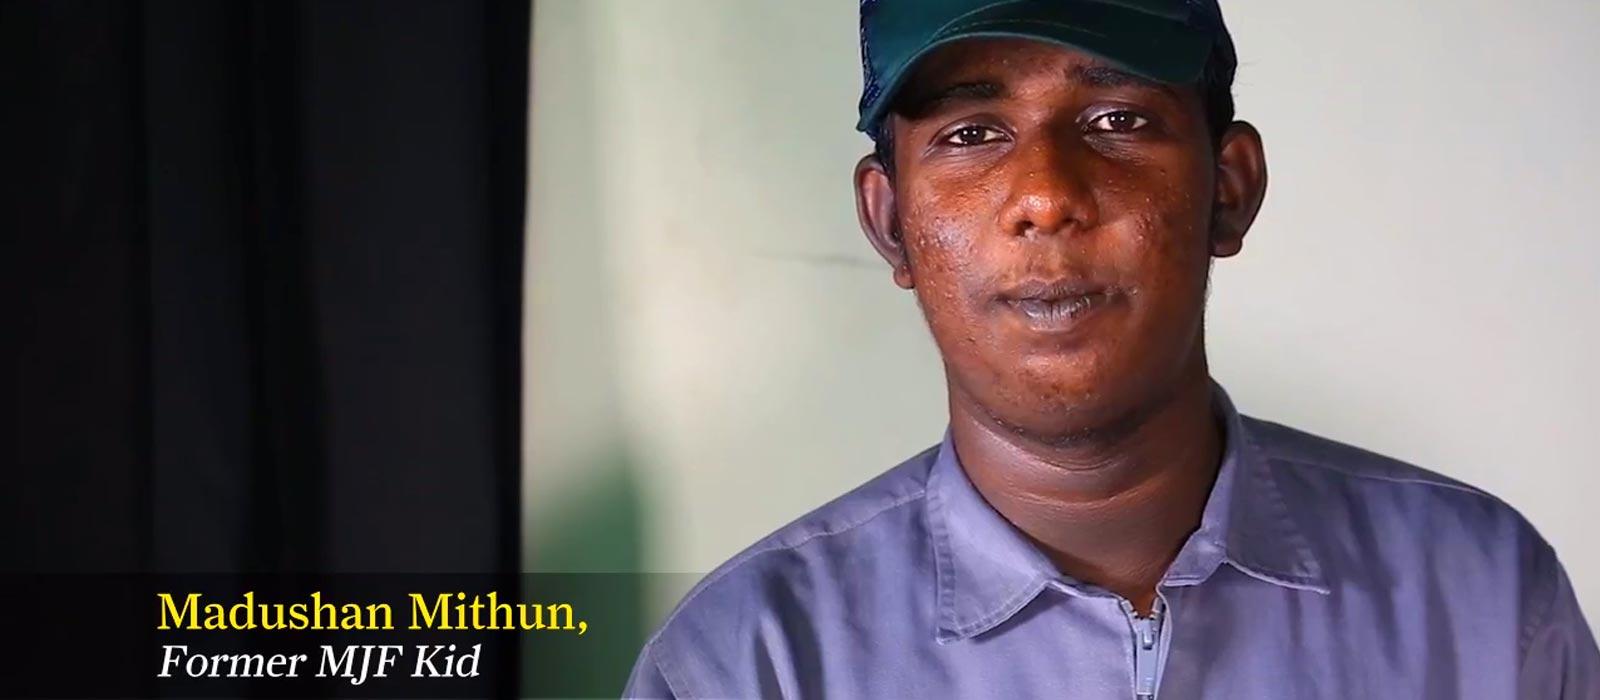 The Story of Mithun Madushan